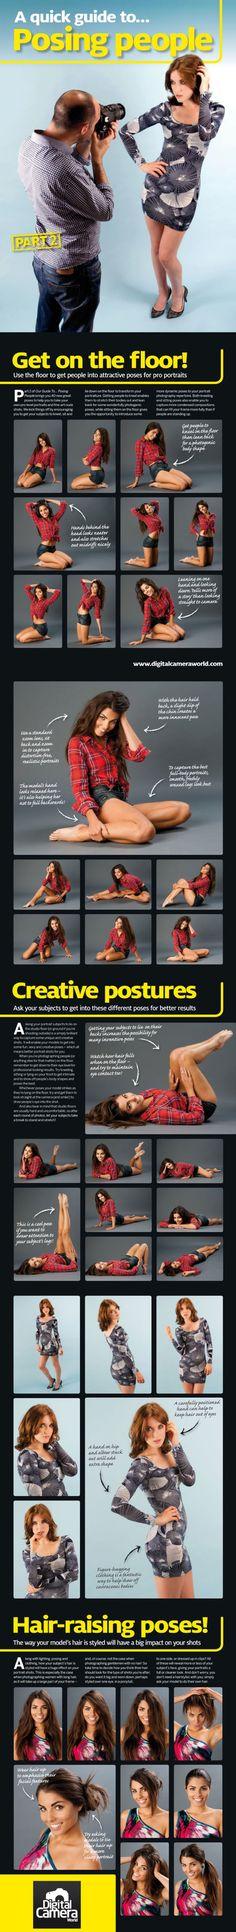 40 More Portrait Photography Ideas | Infographic